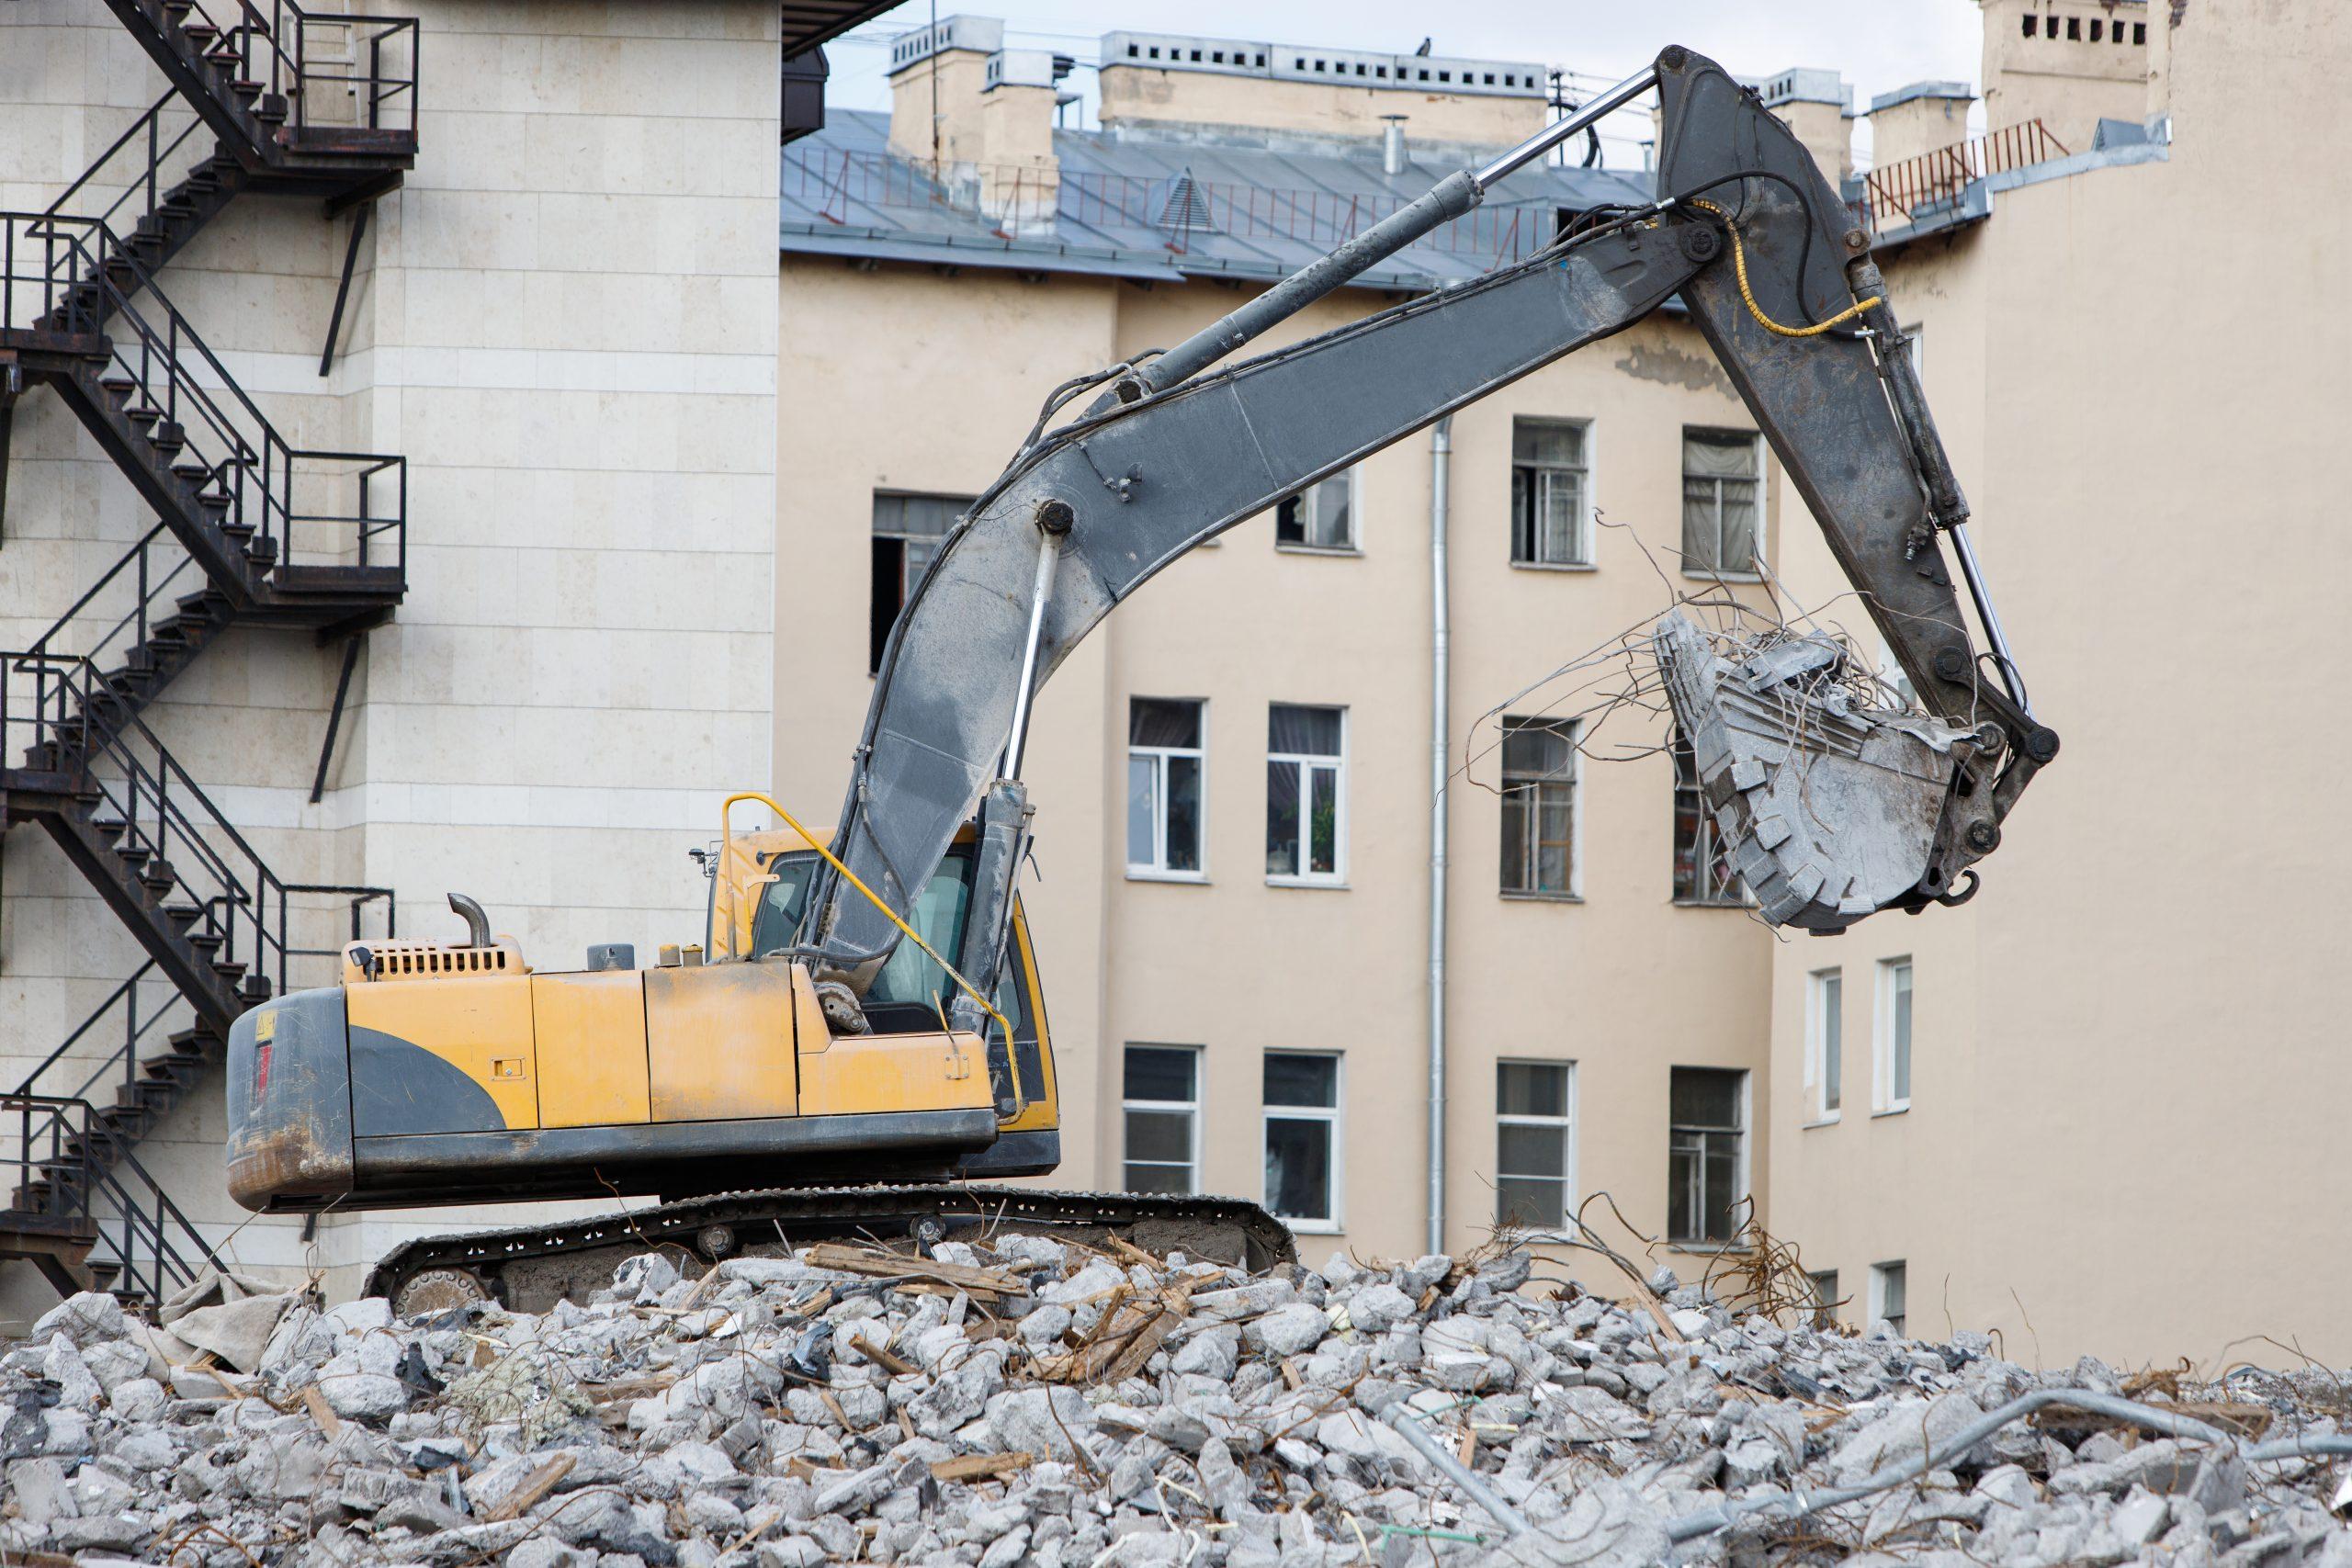 Excavating machine on demolition site driving on pile of broken concrete.